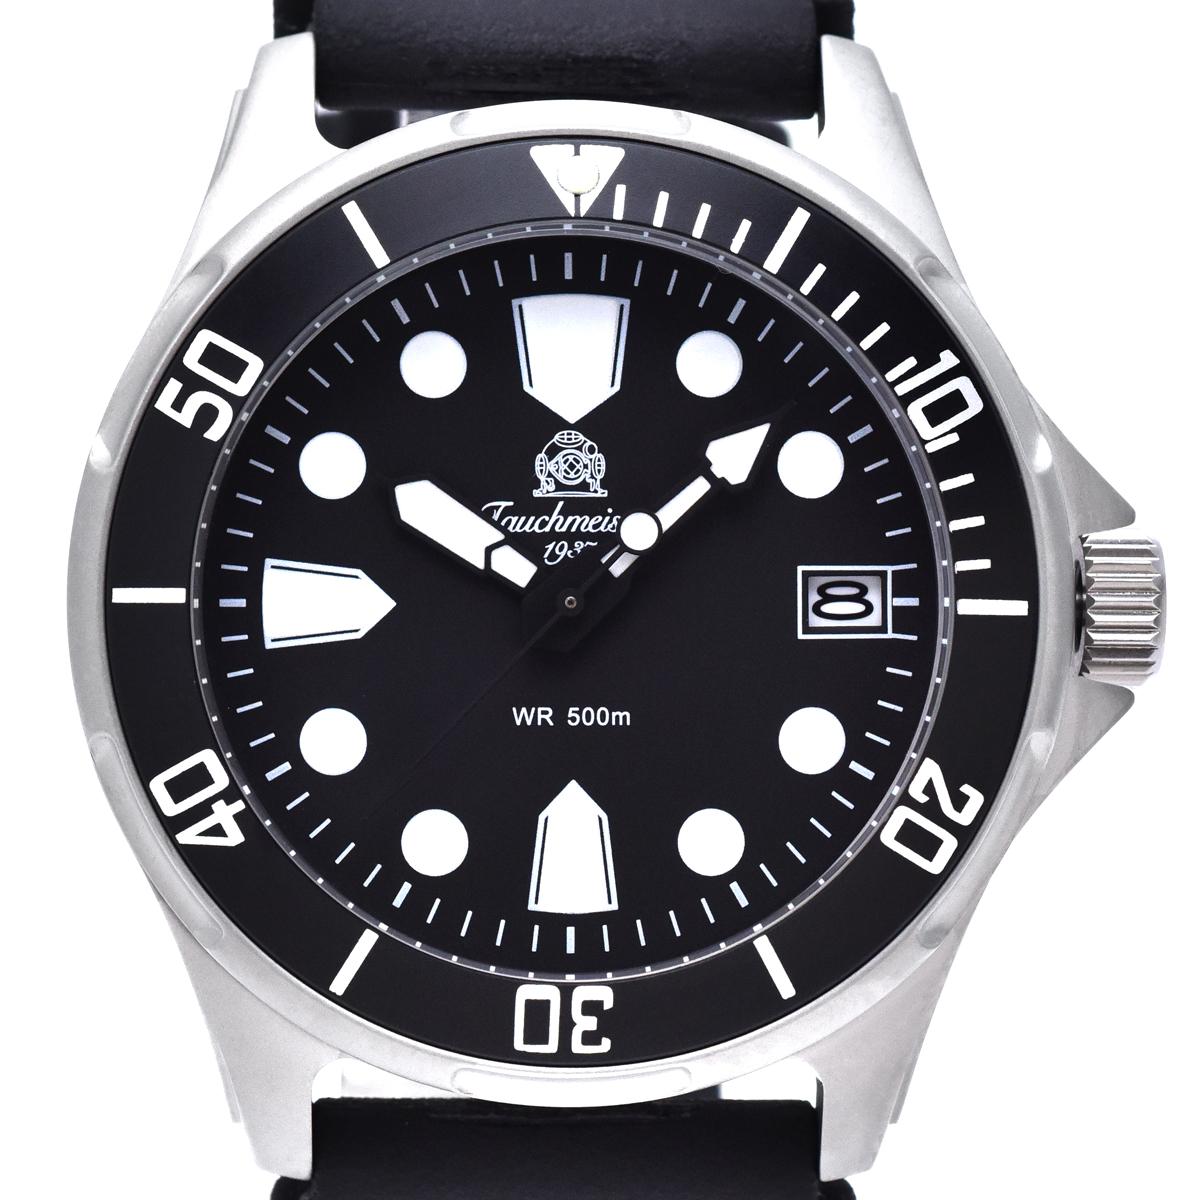 Tauchmeister 1937 トーチマイスター1937 電池式クォーツ 腕時計 [T0321] 並行輸入品 逆回転防止ベゼル  カレンダー